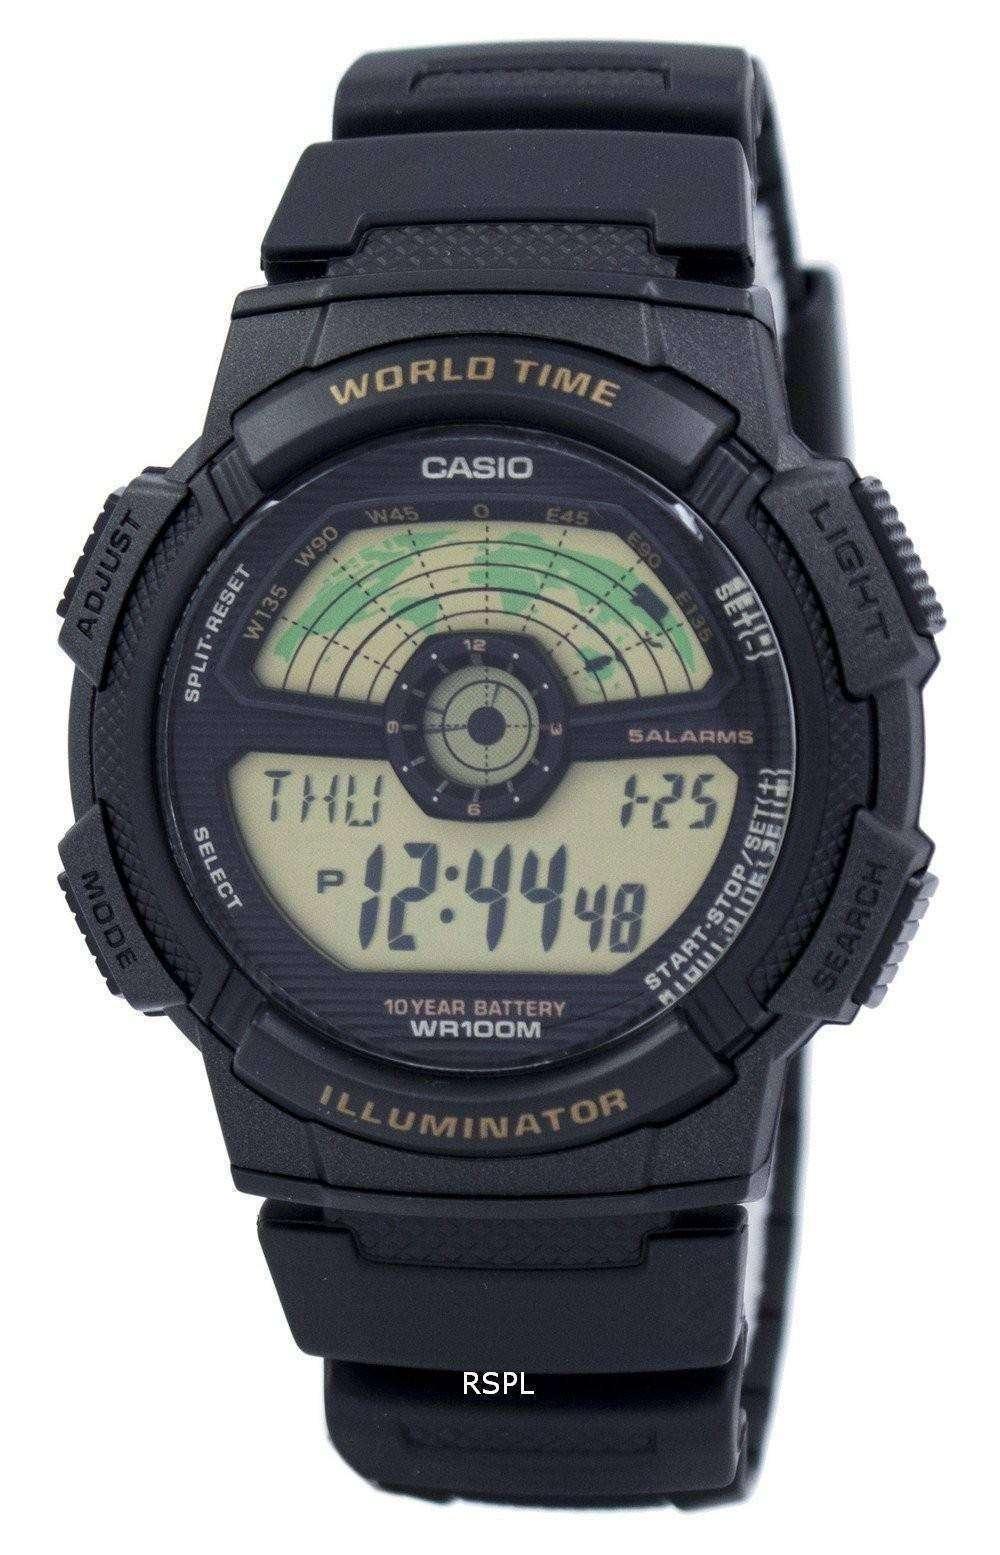 Casio youth illuminator world time world map ae 1100w 1bv ae1100w casio youth illuminator world time world map ae 1100w 1bv ae1100w 1bv mens gumiabroncs Gallery